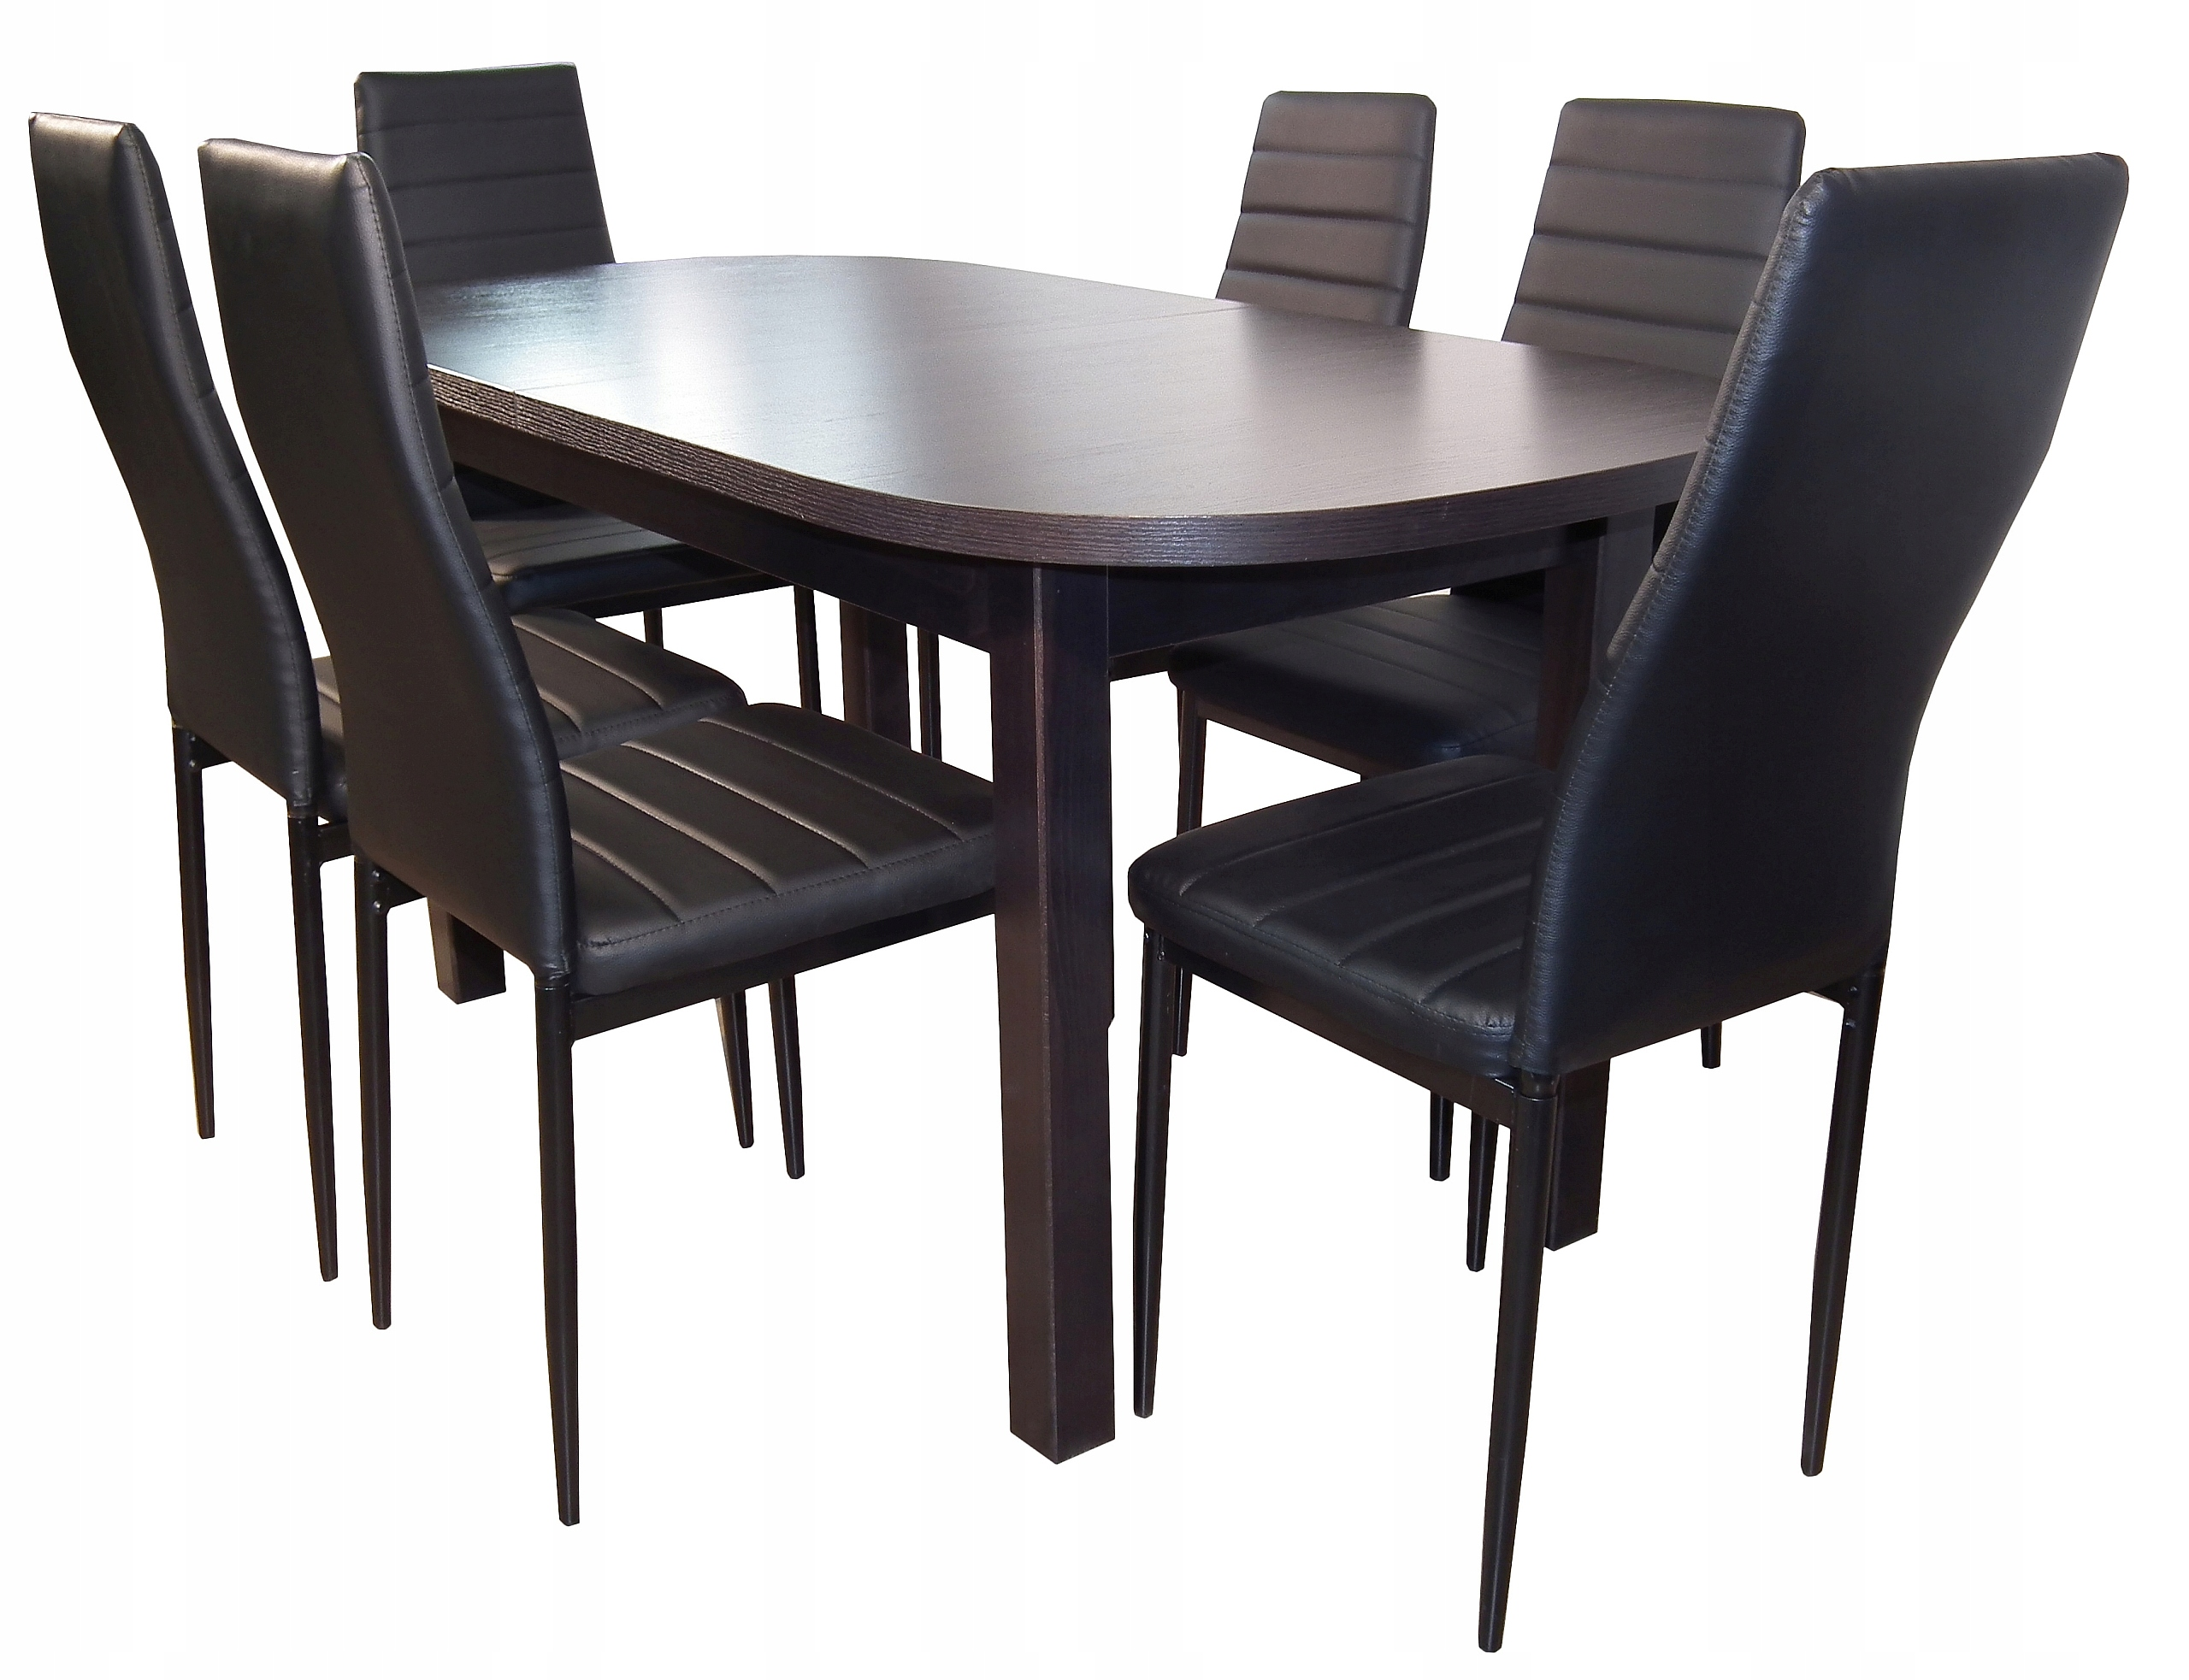 80/160/200 oválny stôl + 6 stoličiek eko koža